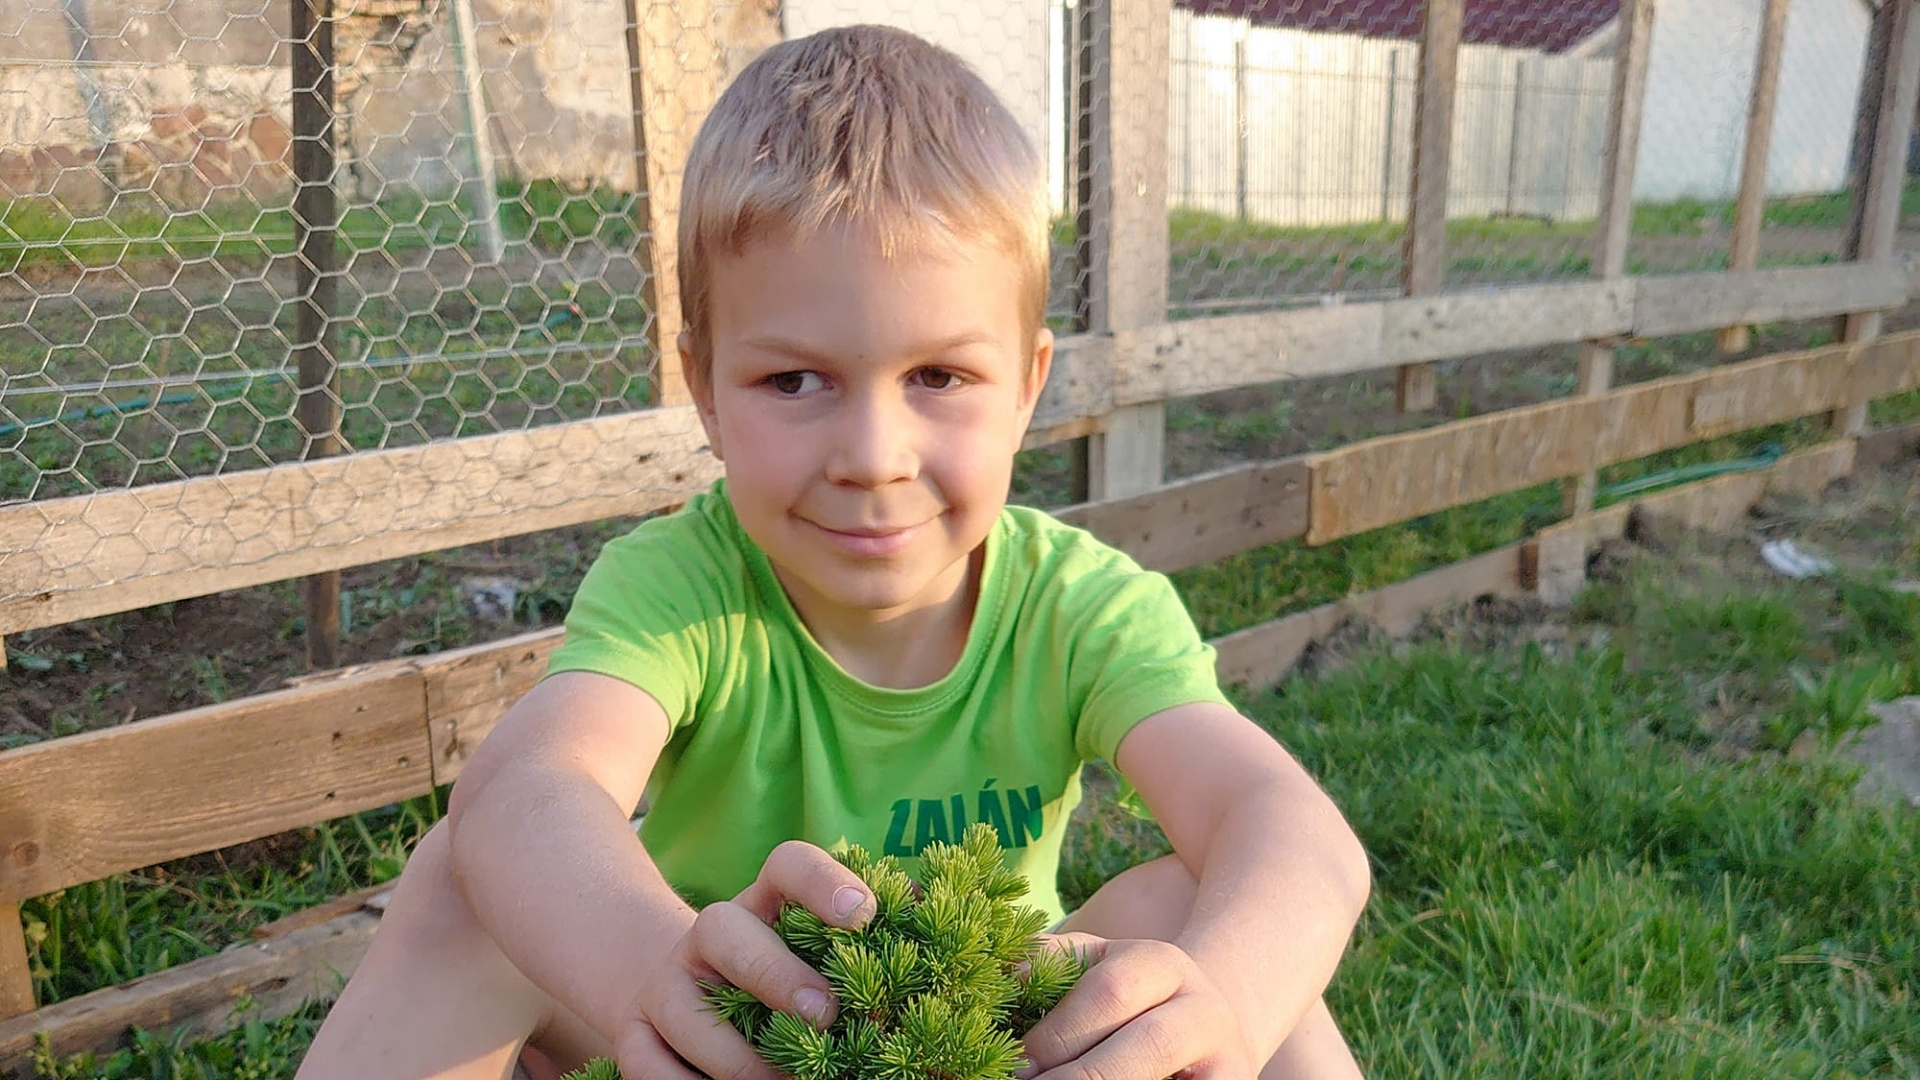 Zalán, a 7 éves szemdaganatos kisfiú